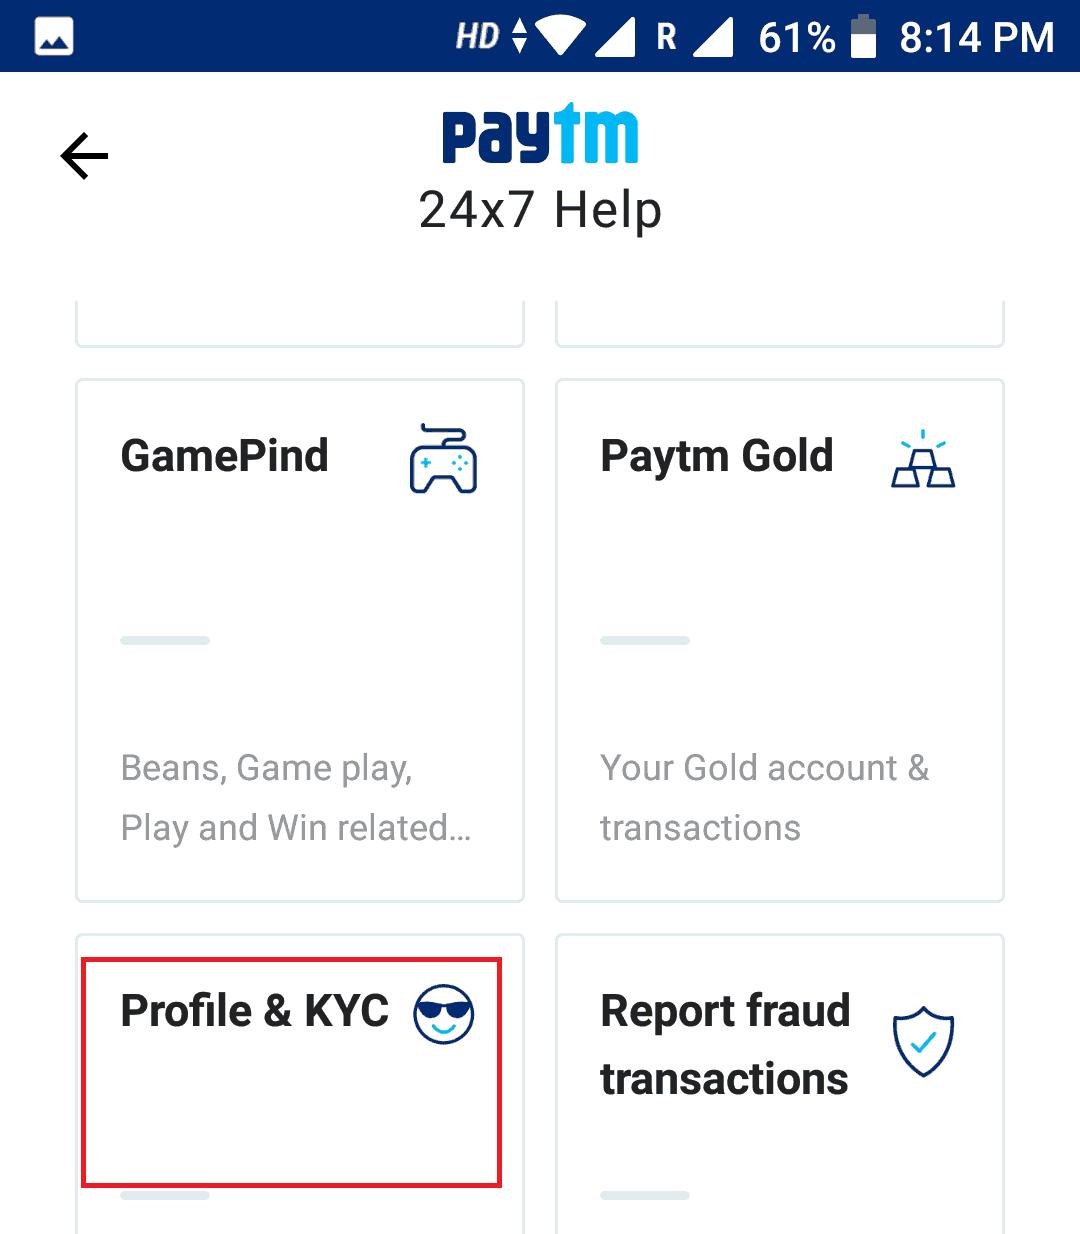 Aadhaar Card Link Bank, Paytm Se Kaise Hataye(unlink